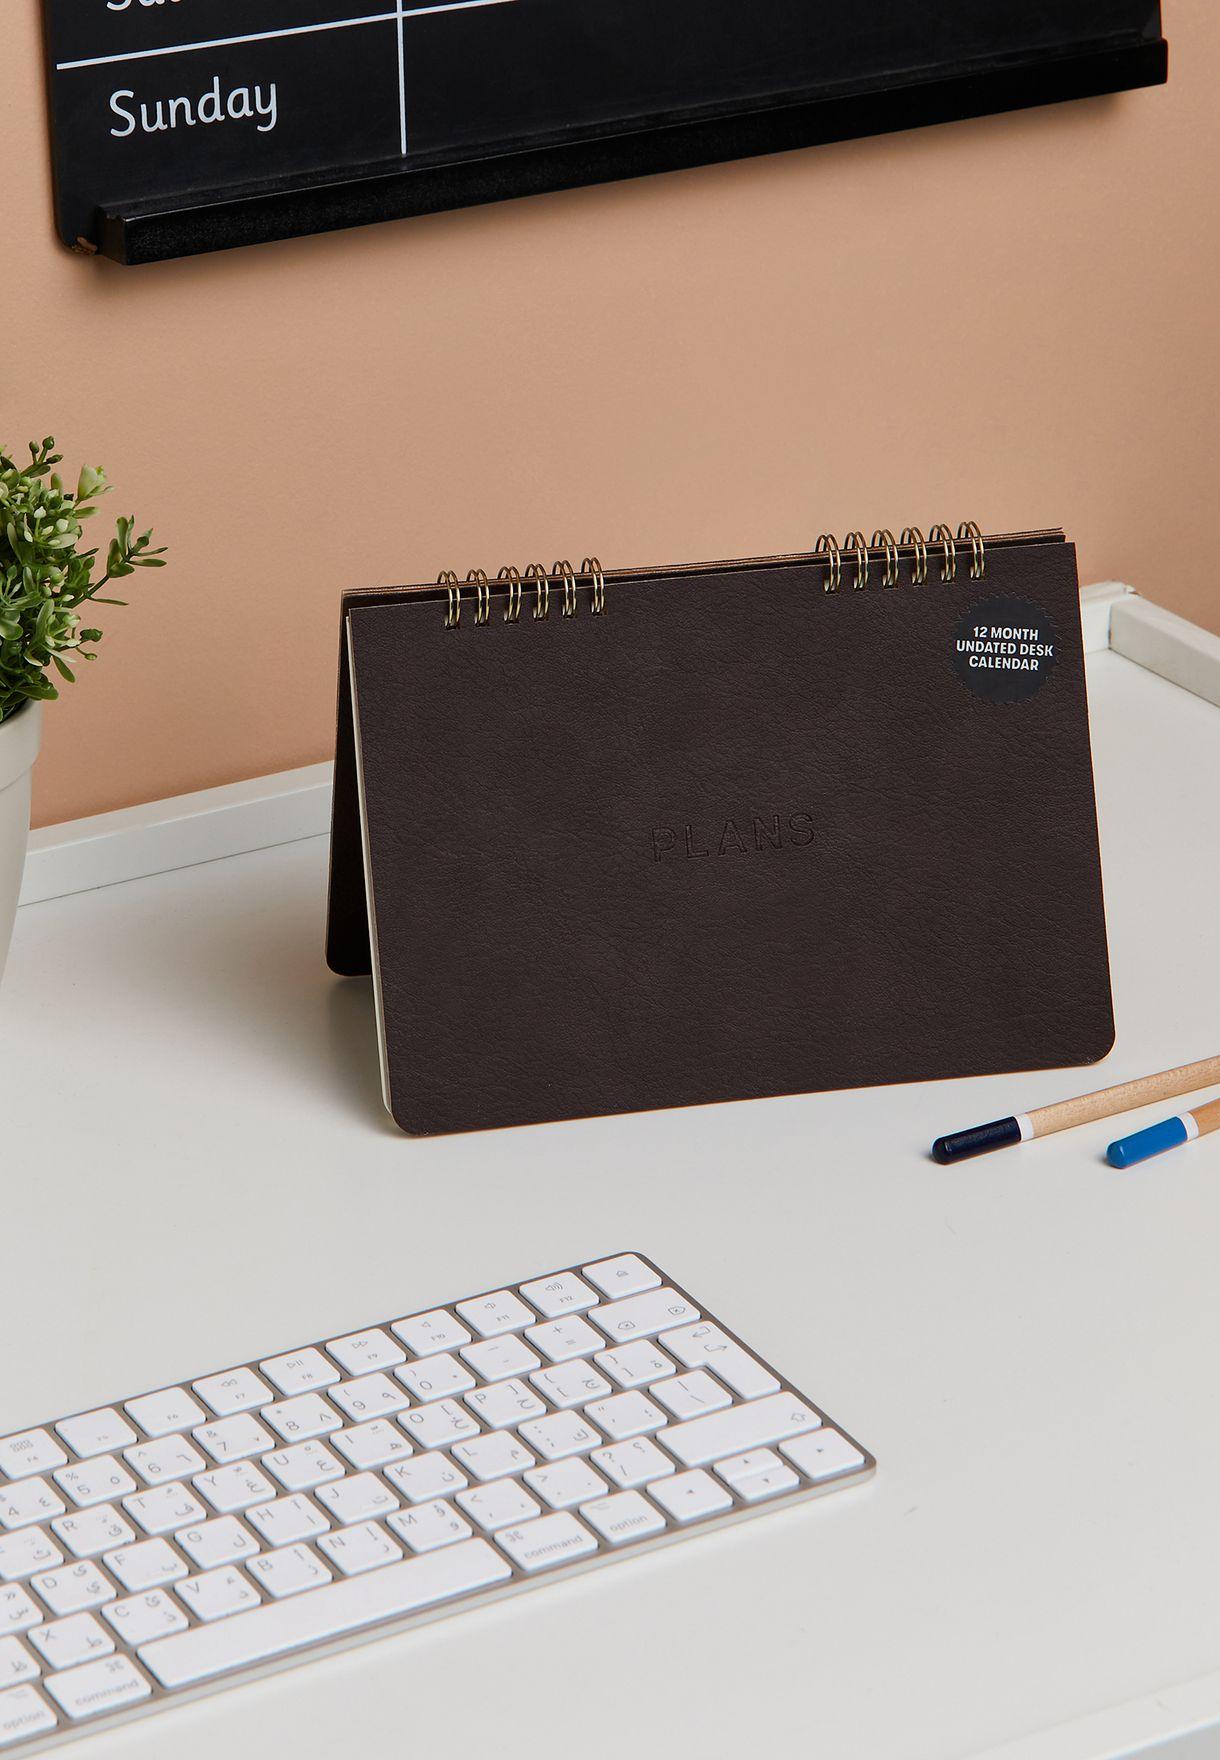 Undated Buffalo Flip Desk Calendar